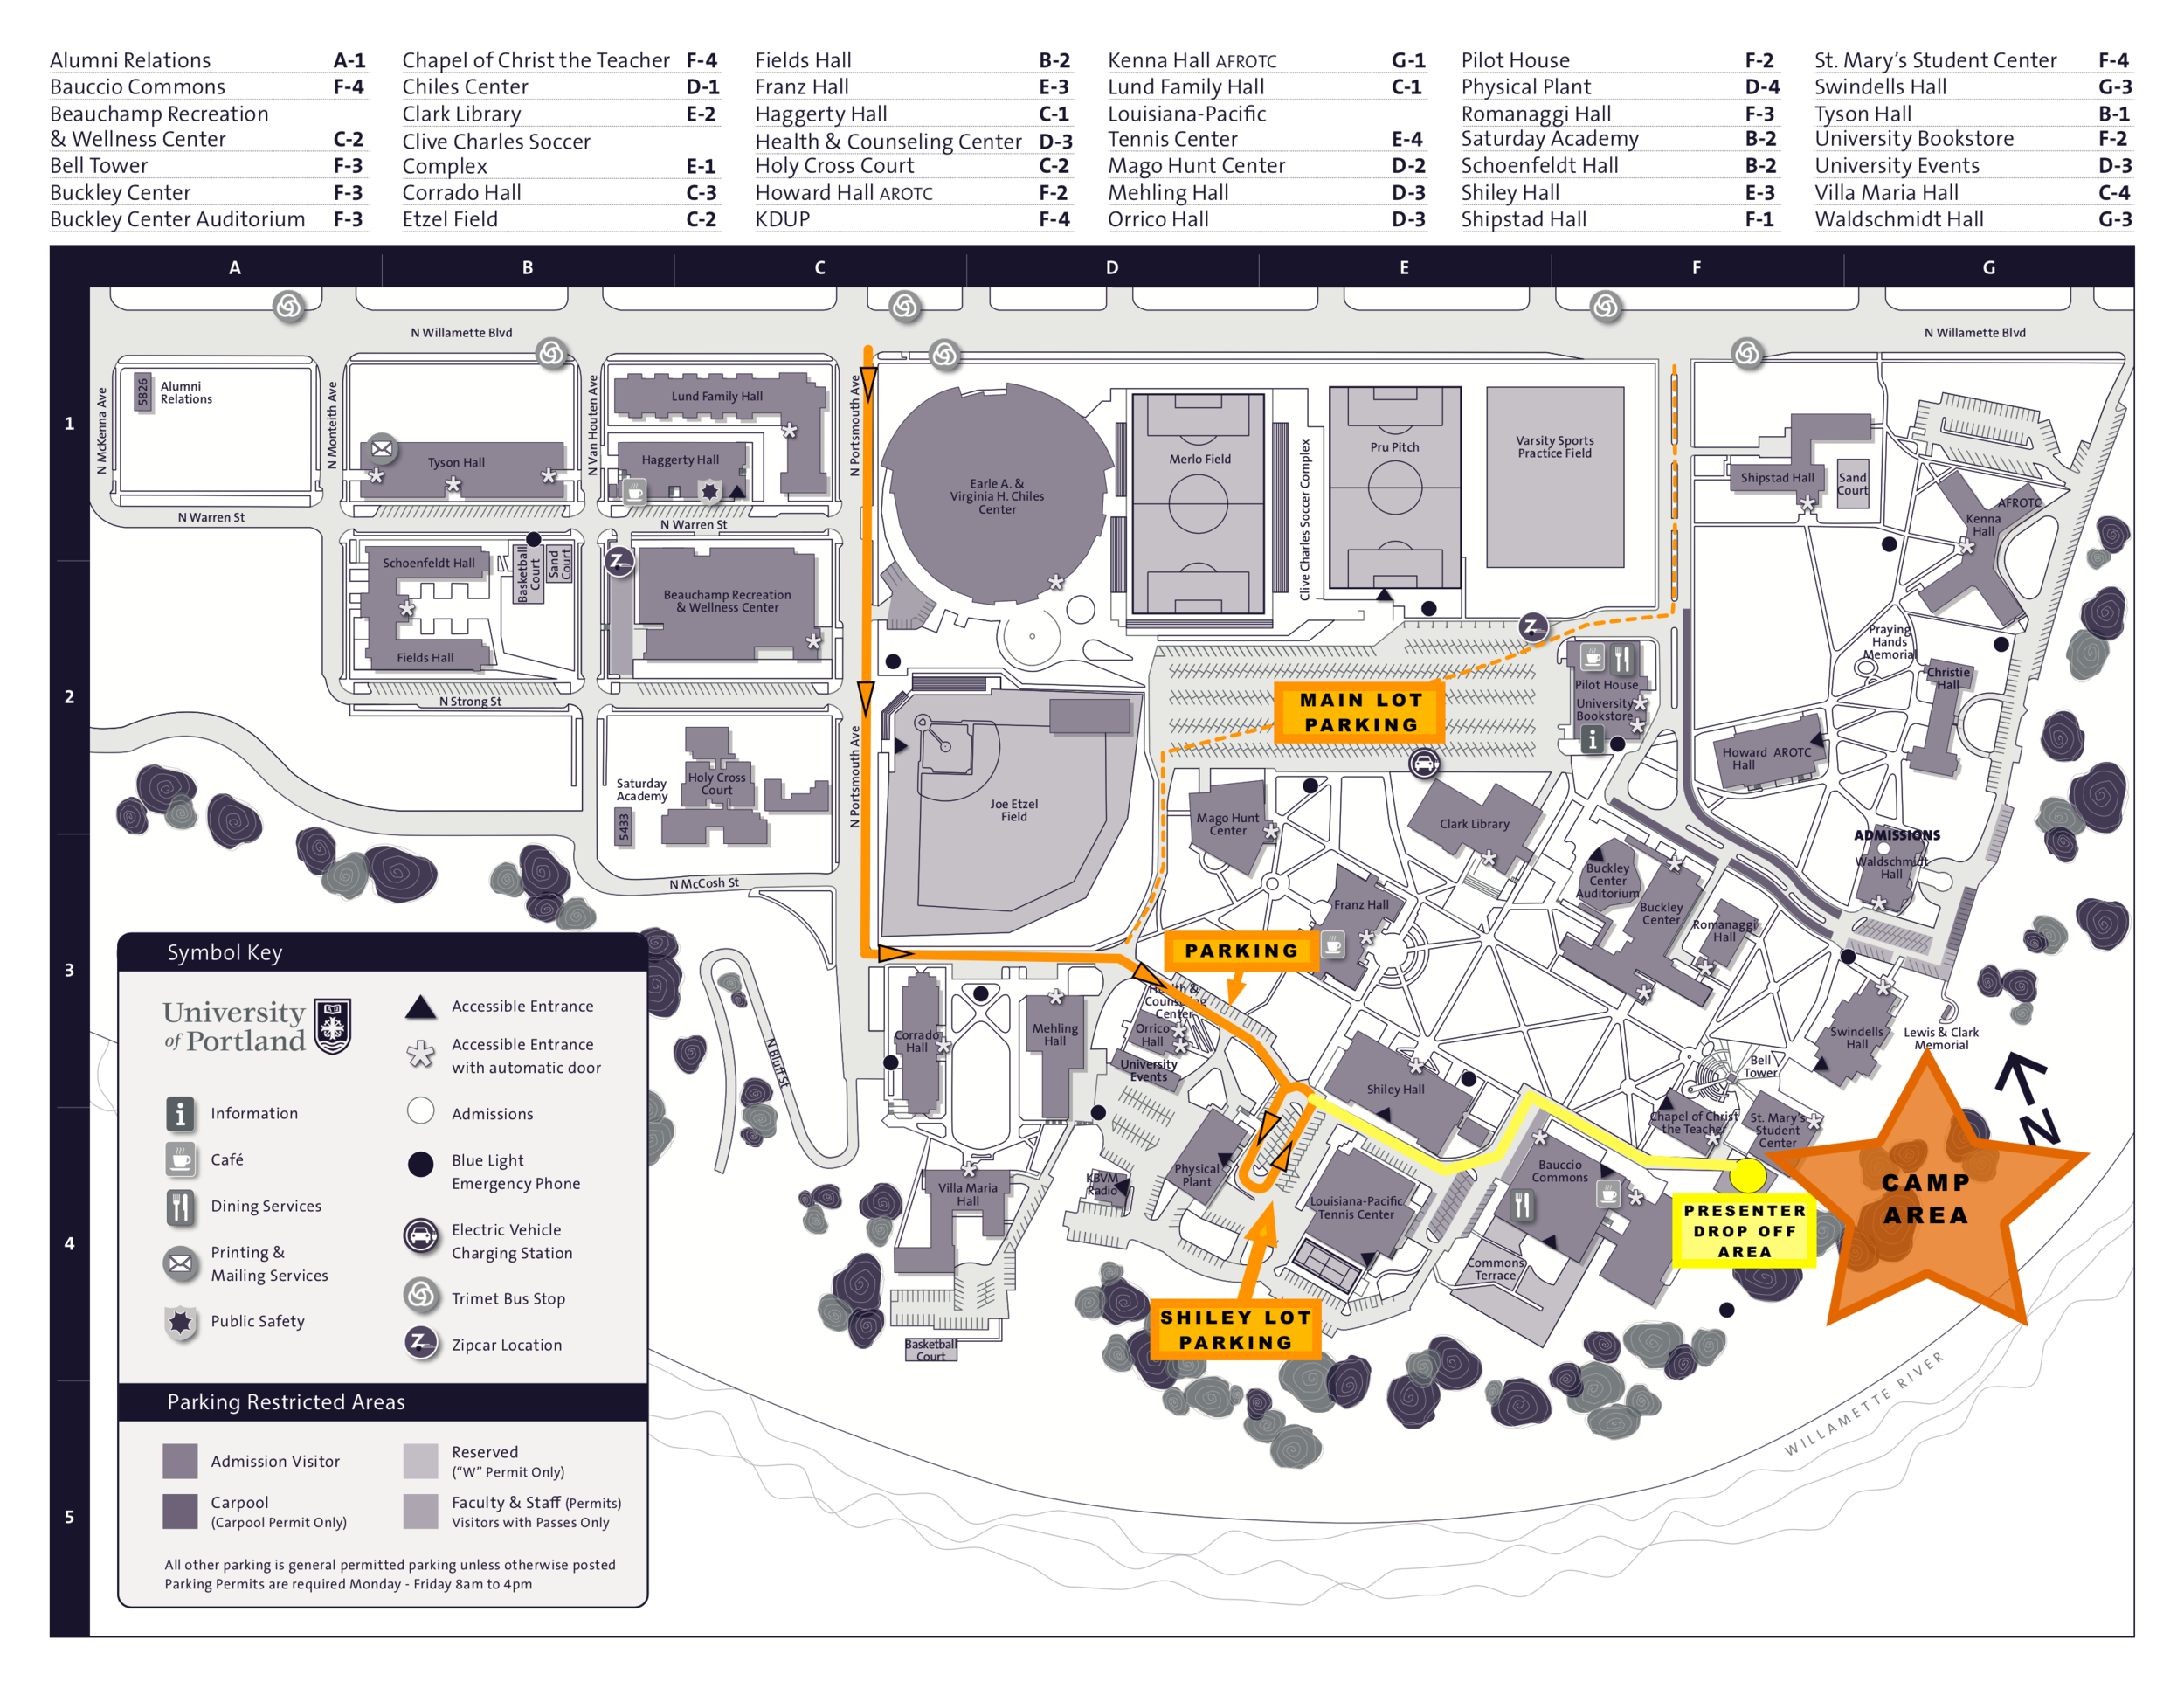 Campus Map Parking Presenter.png